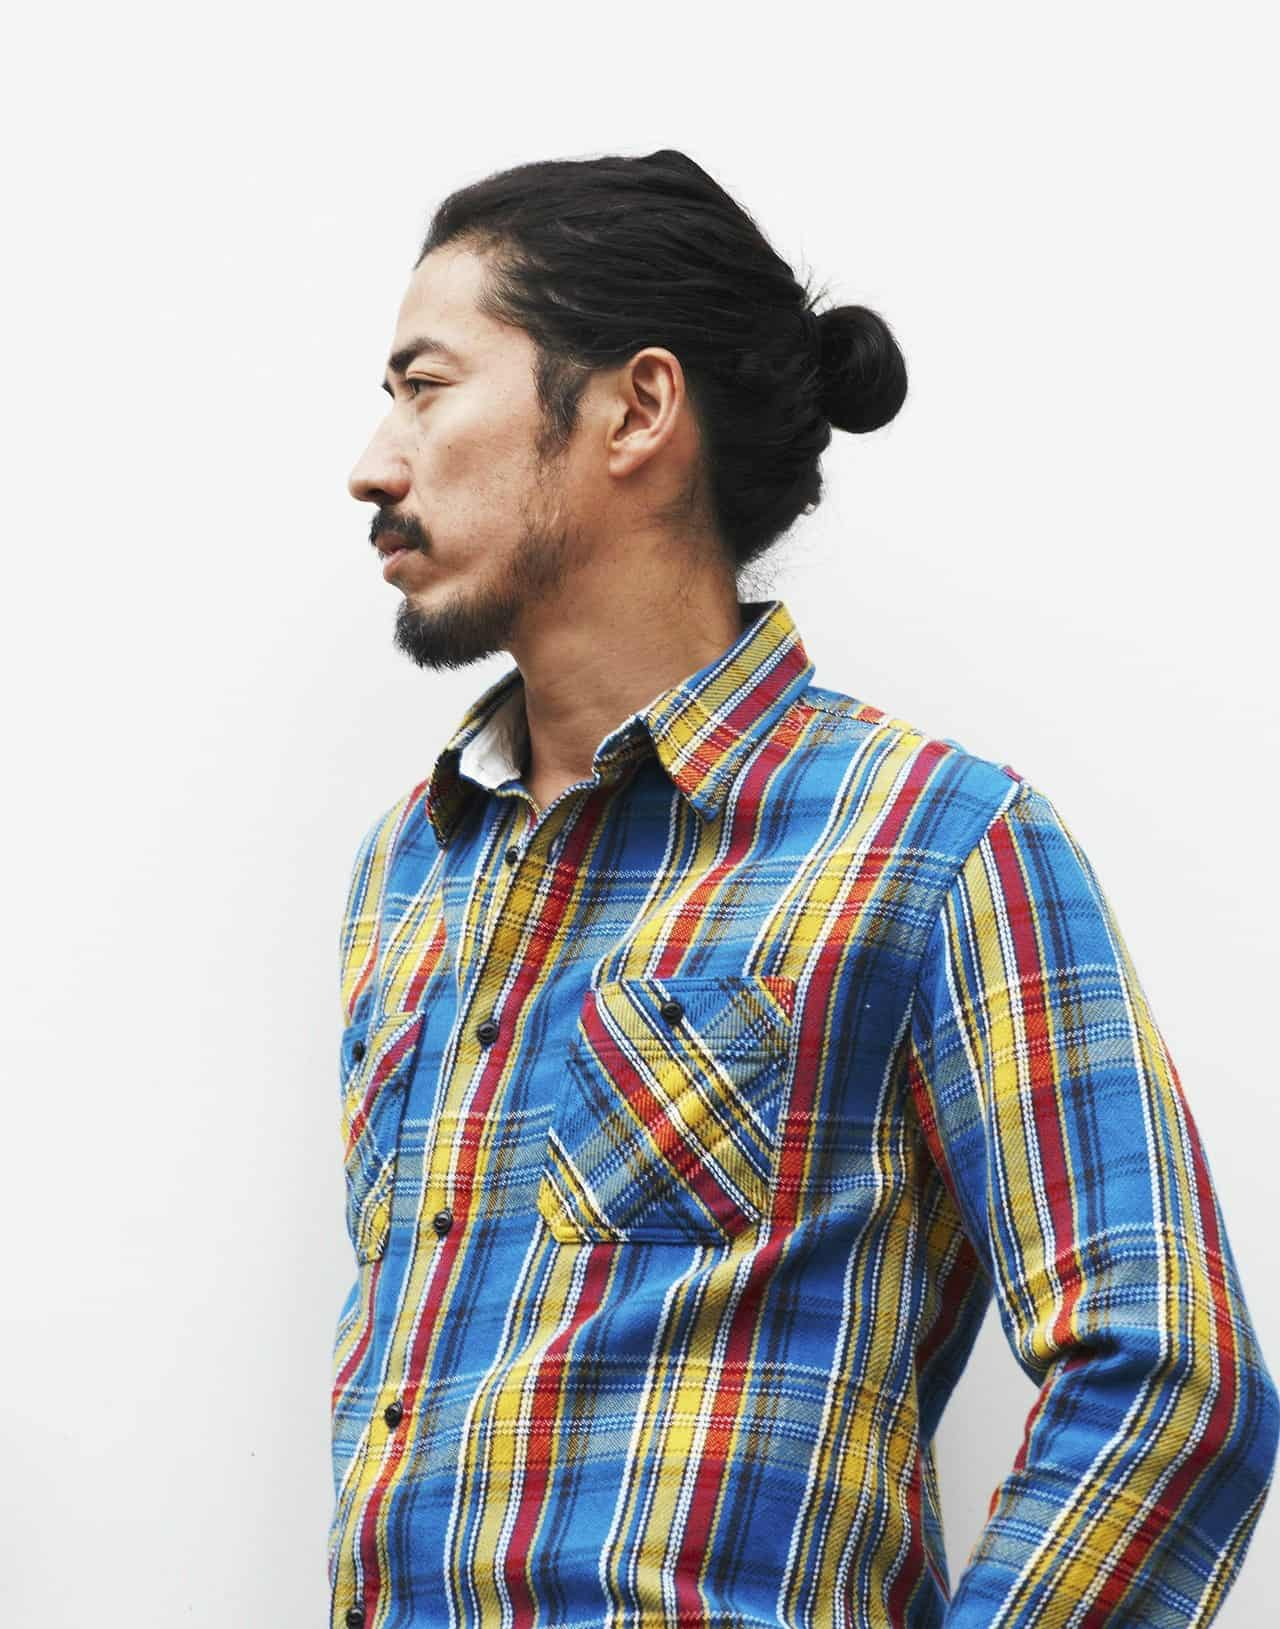 Brilliant 50 Charming Asian Hairstyles For Men New In 2016 Short Hairstyles For Black Women Fulllsitofus